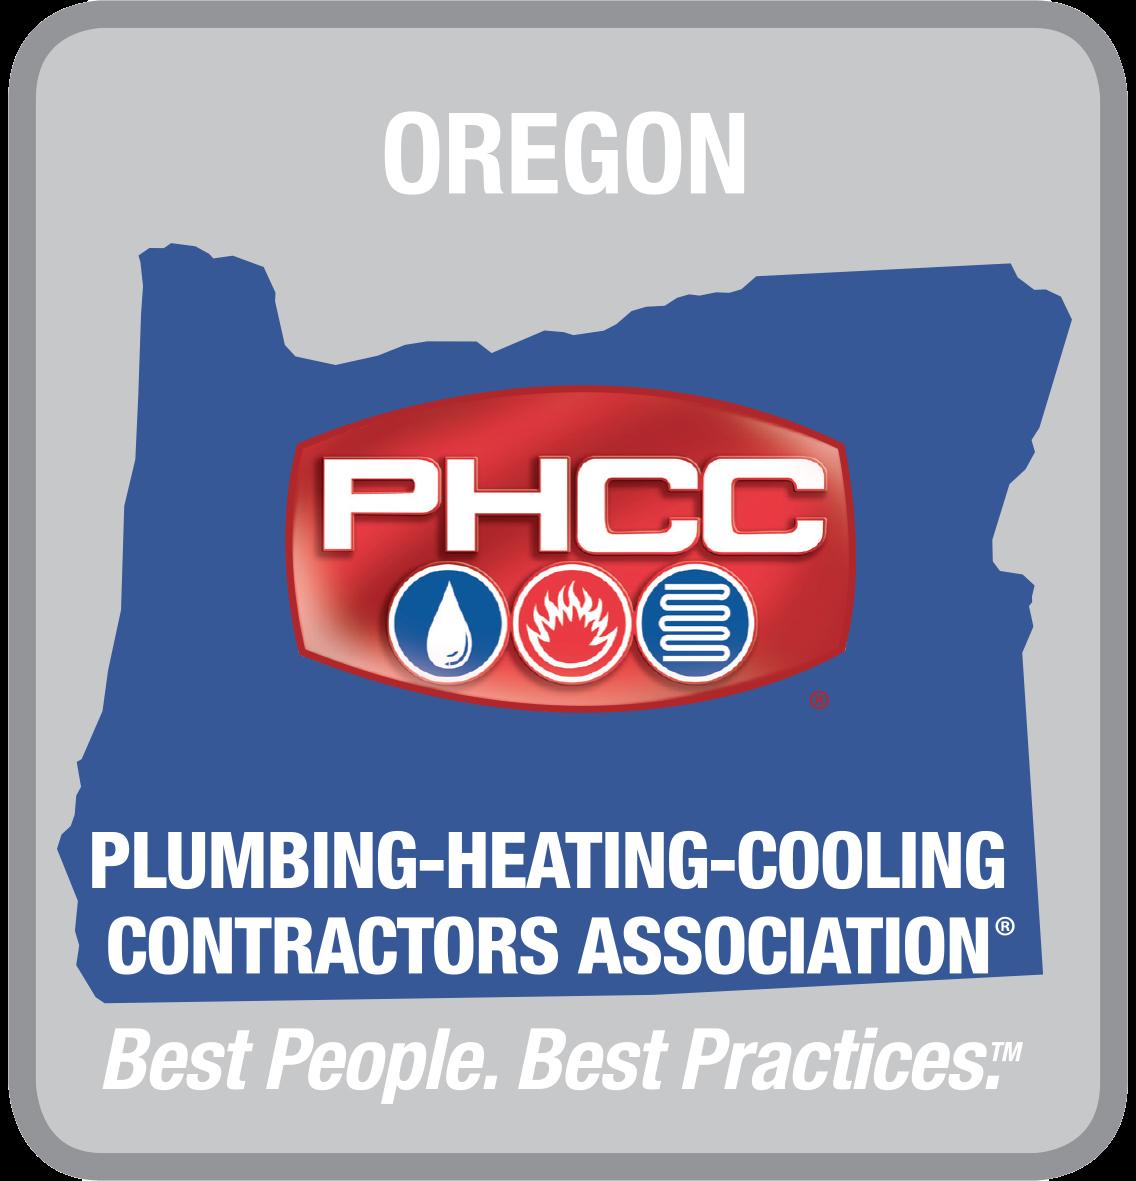 Oregon-PHCC-logo.png